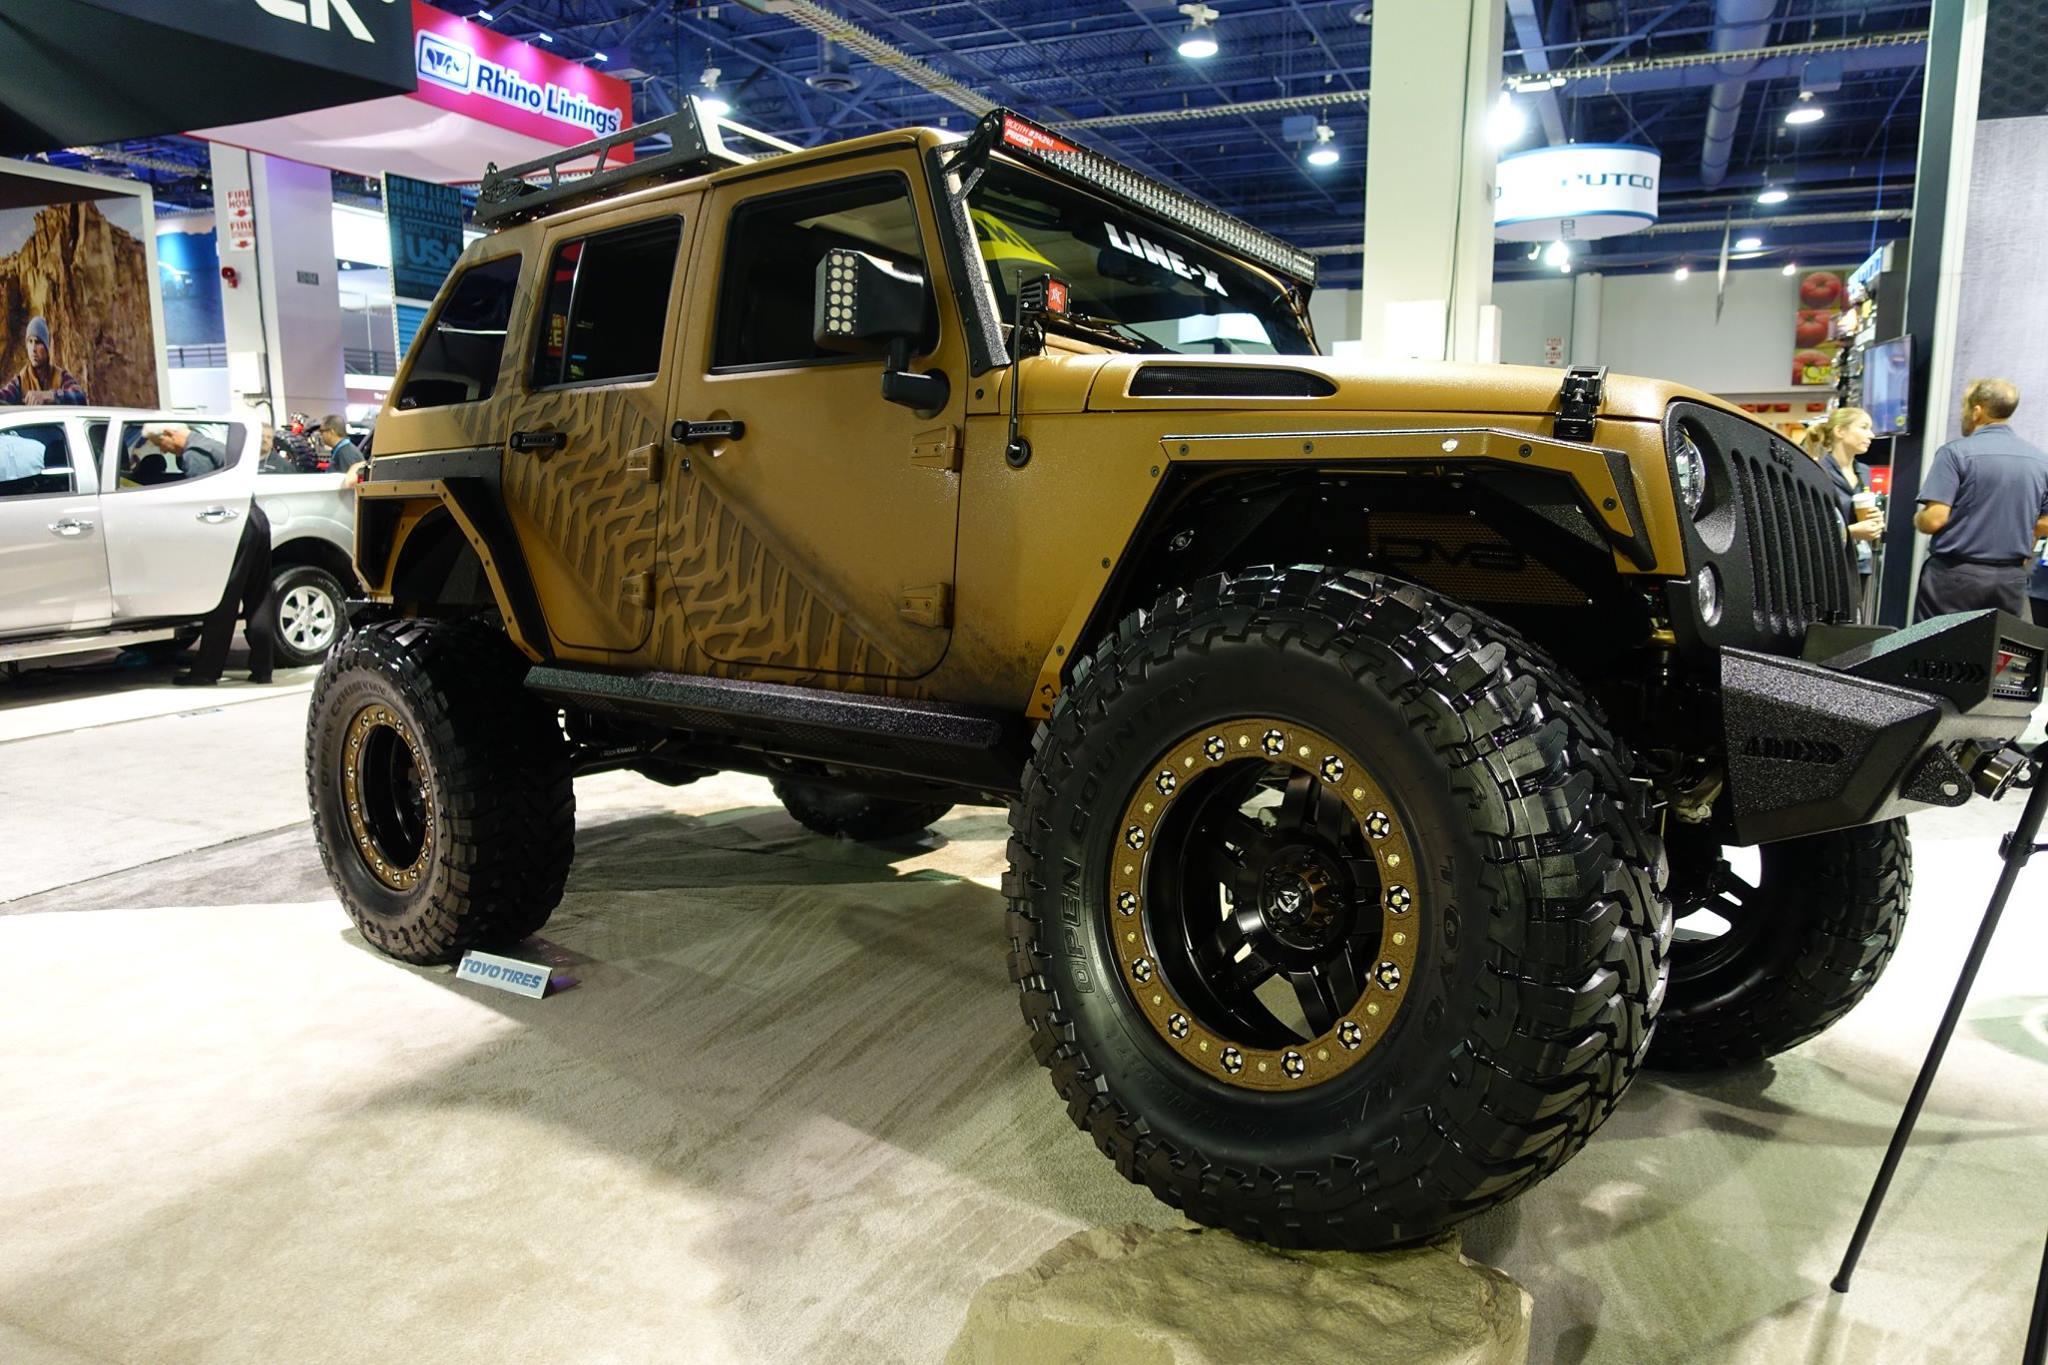 3d line x 2015 jk unlimited rubicon vision jeep. Black Bedroom Furniture Sets. Home Design Ideas